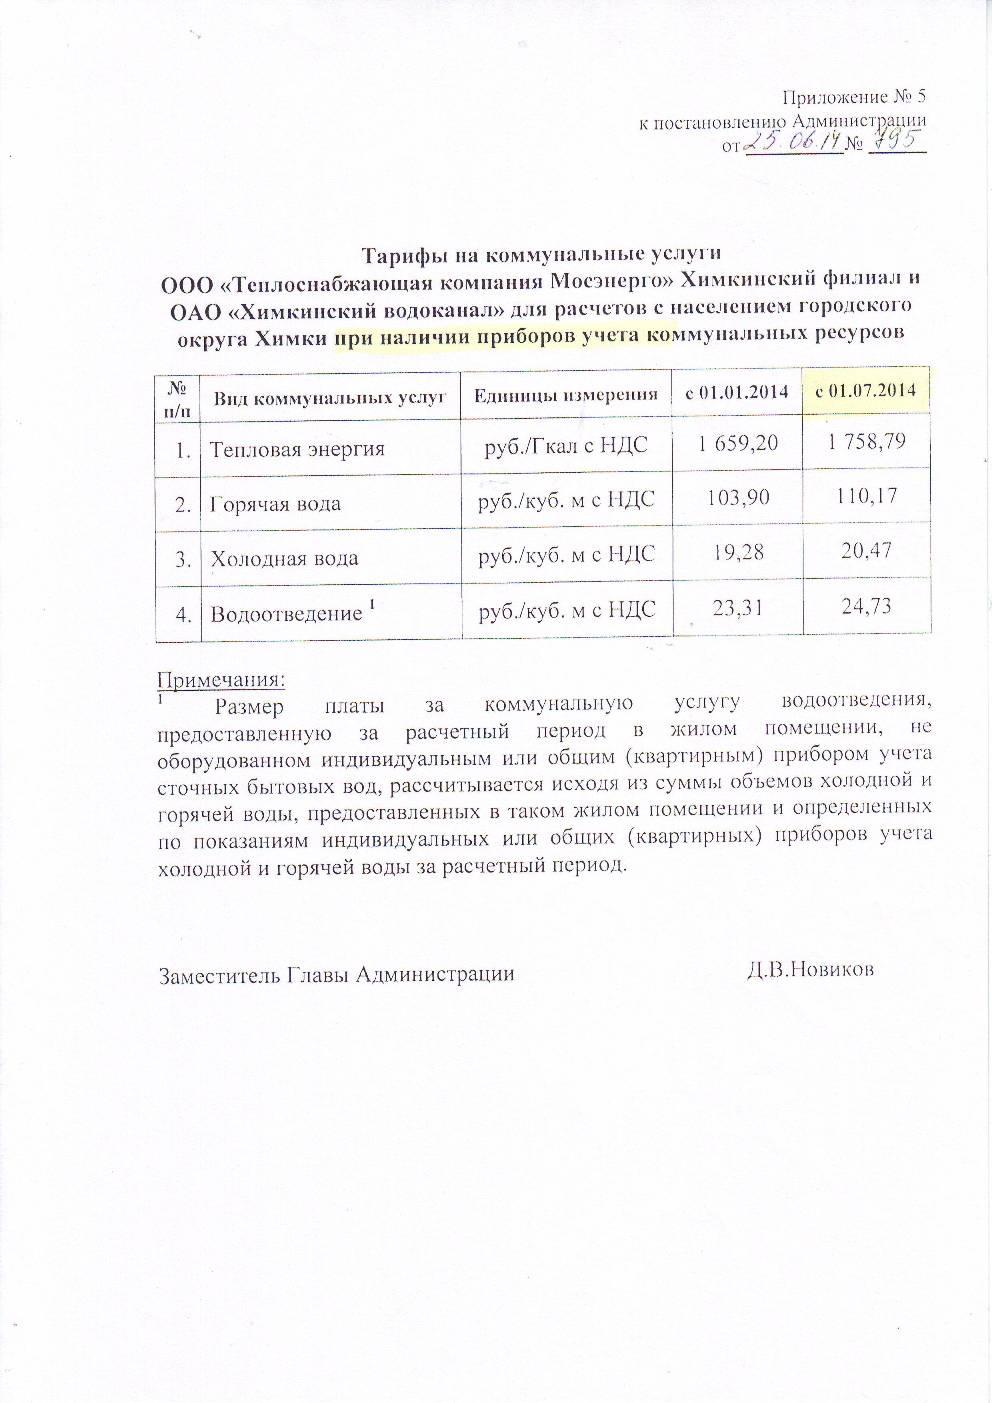 Тарифы на воду Новиков